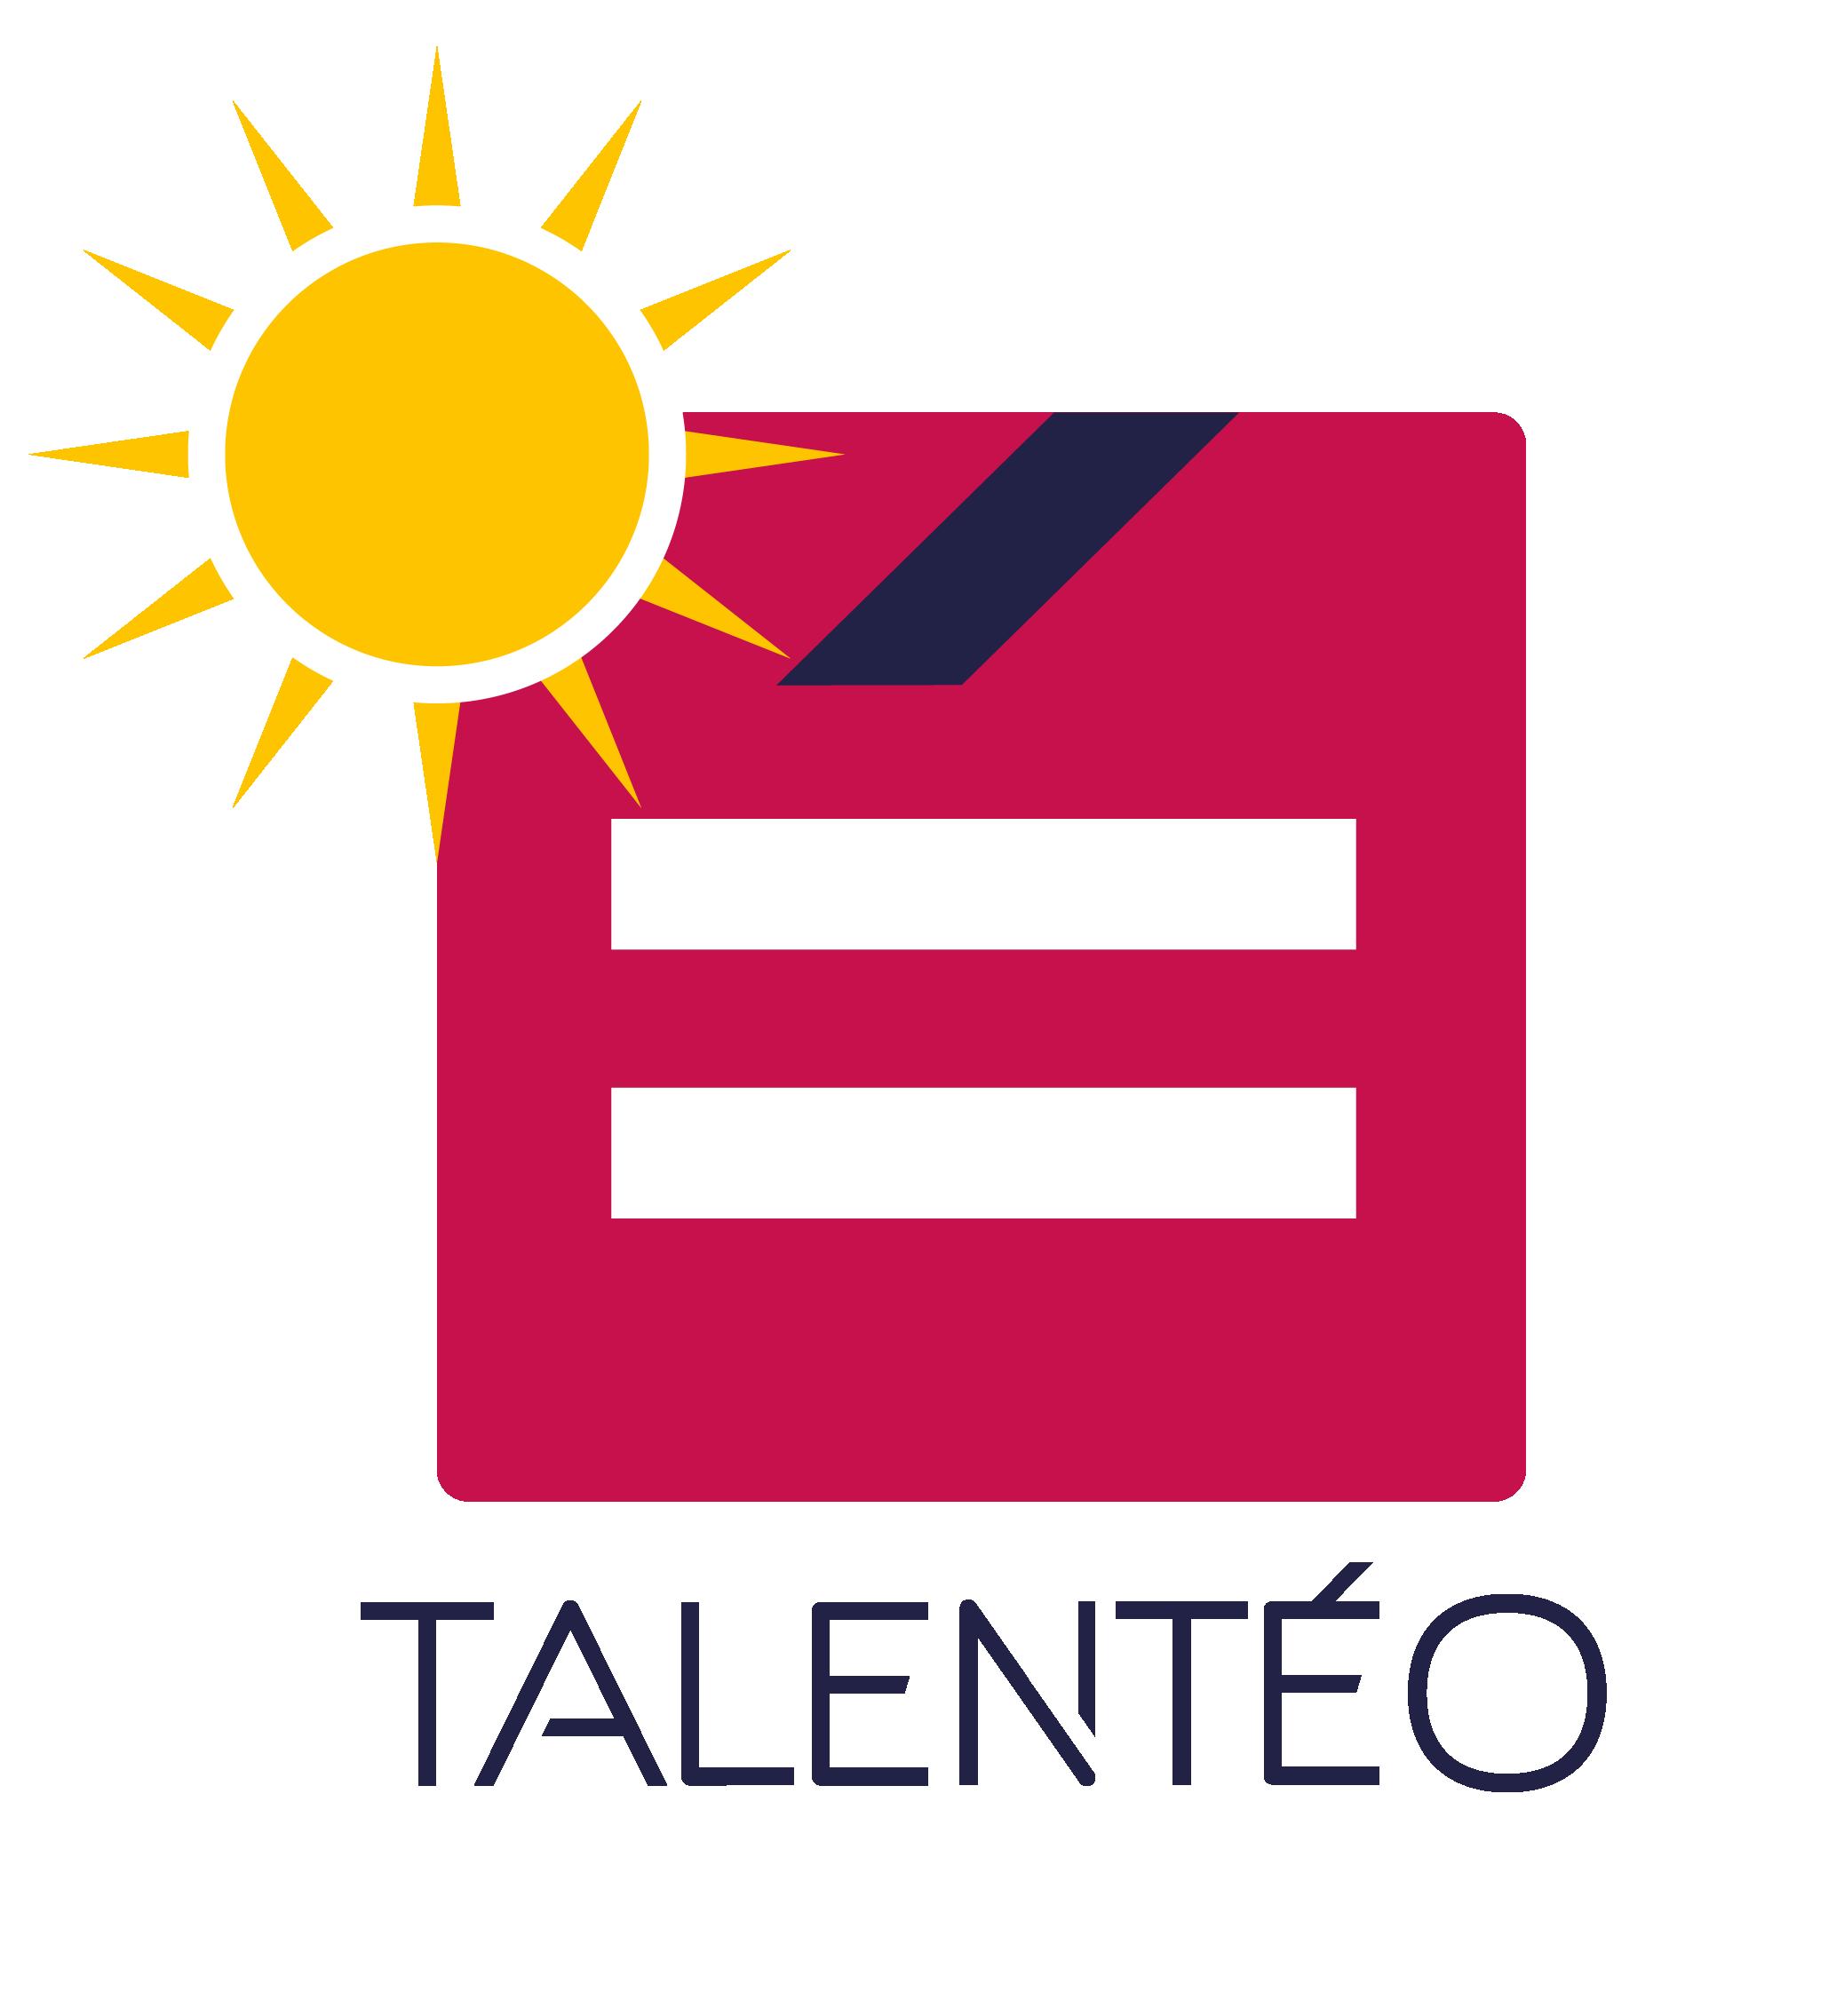 Talentéo | Votre média digital inclusif | talenteo.fr